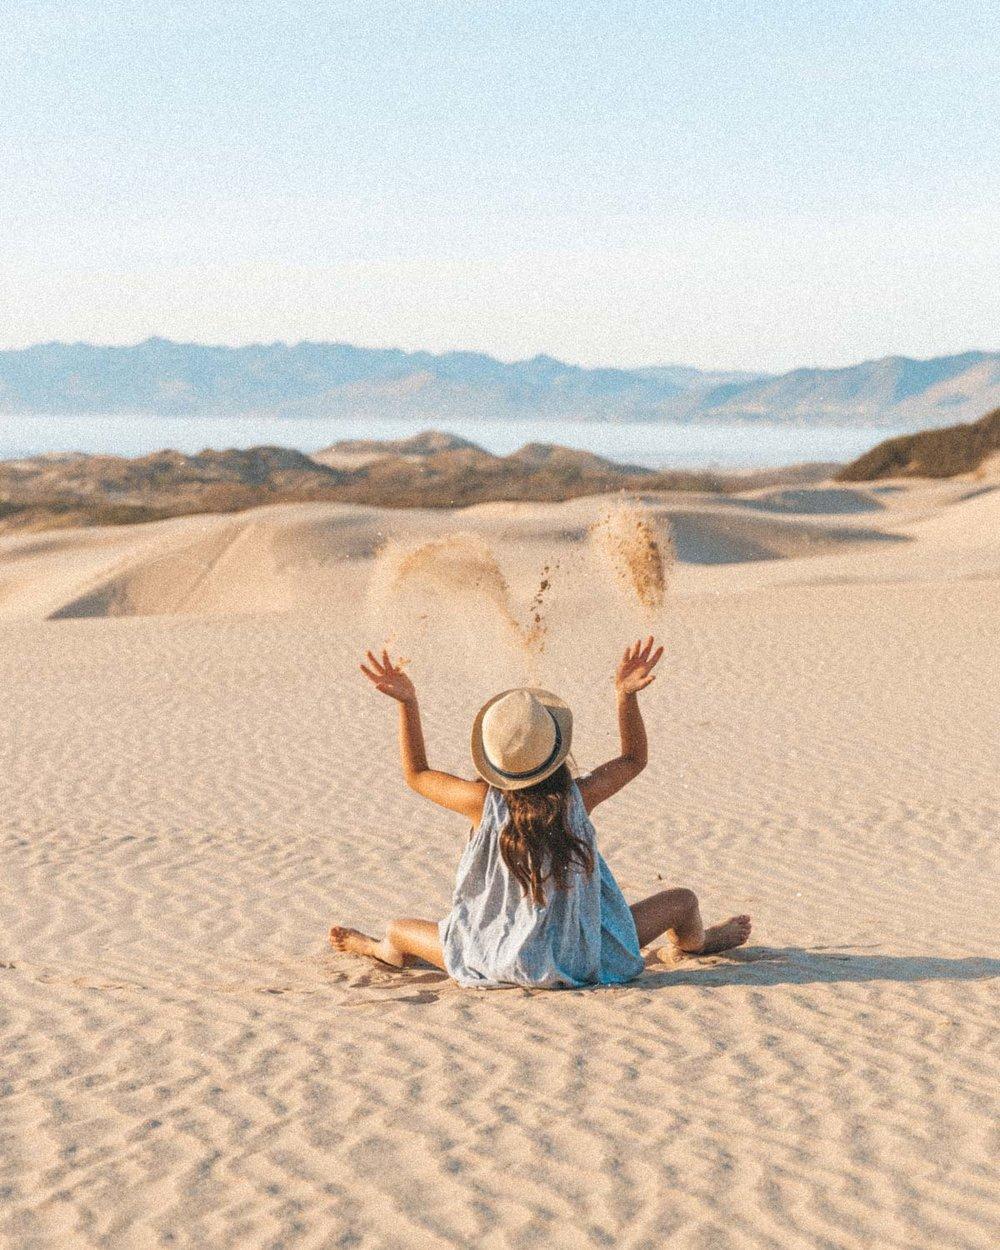 Pismo Beach, California, USA by Madeline Lu @lumadeline